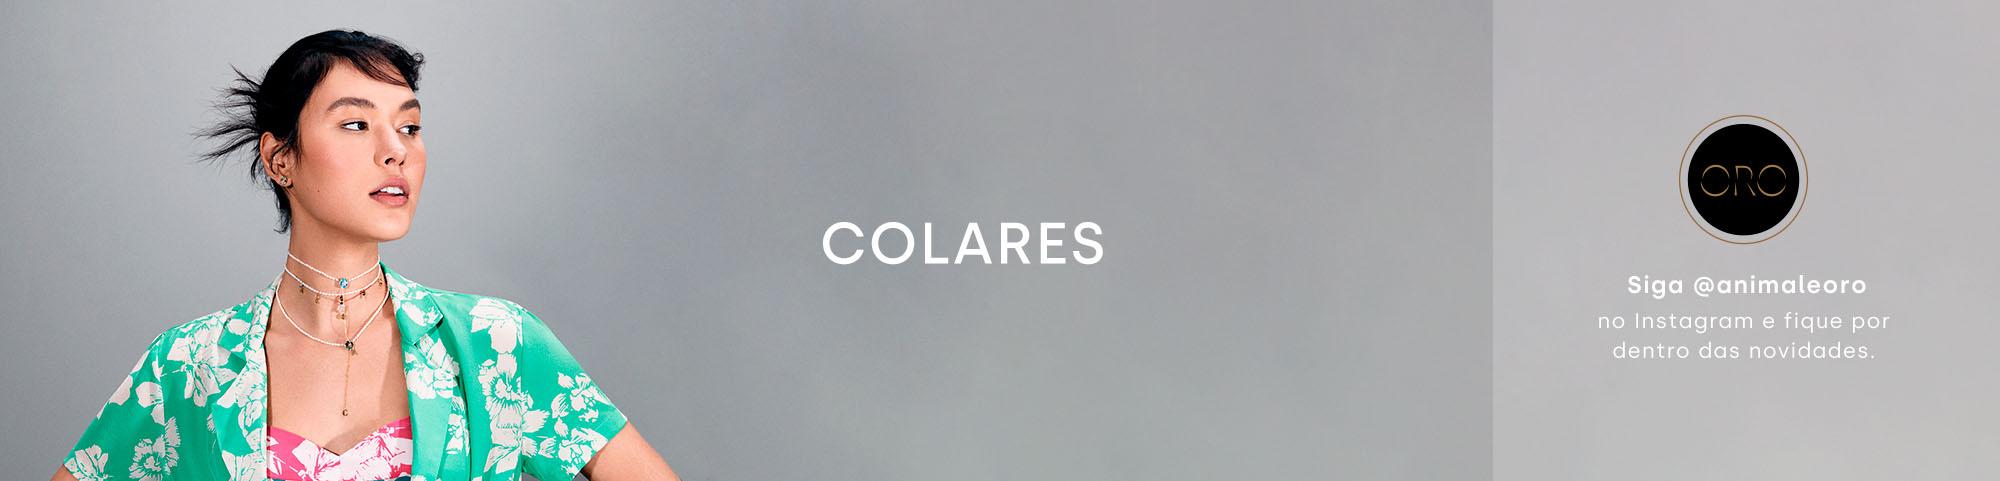 Bannner Joias Colares